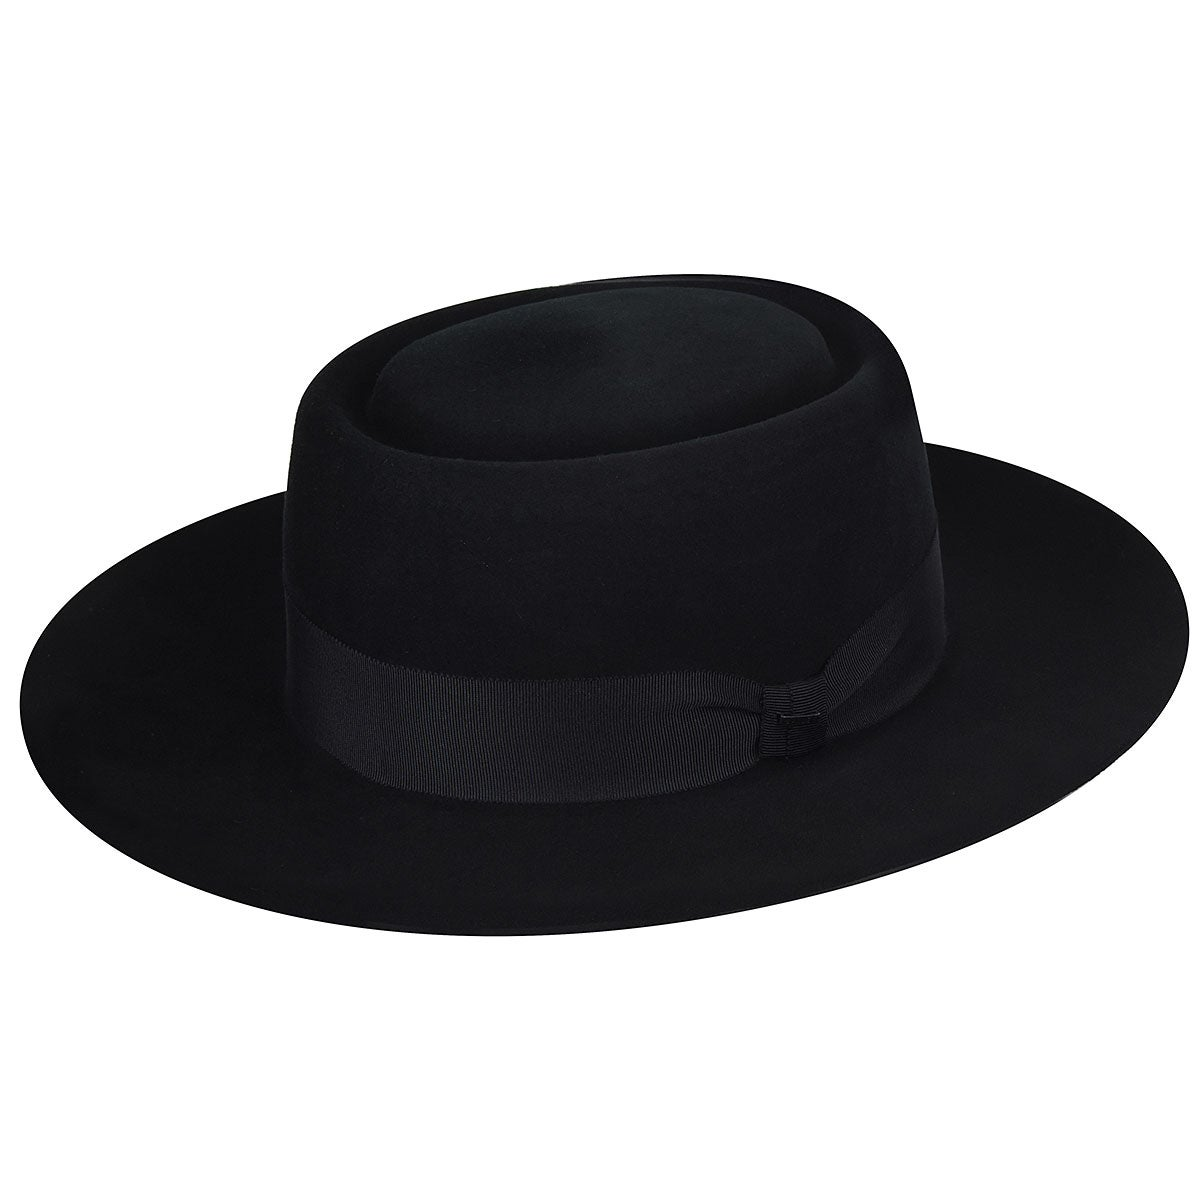 1940s Mens Hats | Fedora, Homburg, Porkpie Hats Walsh Elite Pork Pie $160.00 AT vintagedancer.com